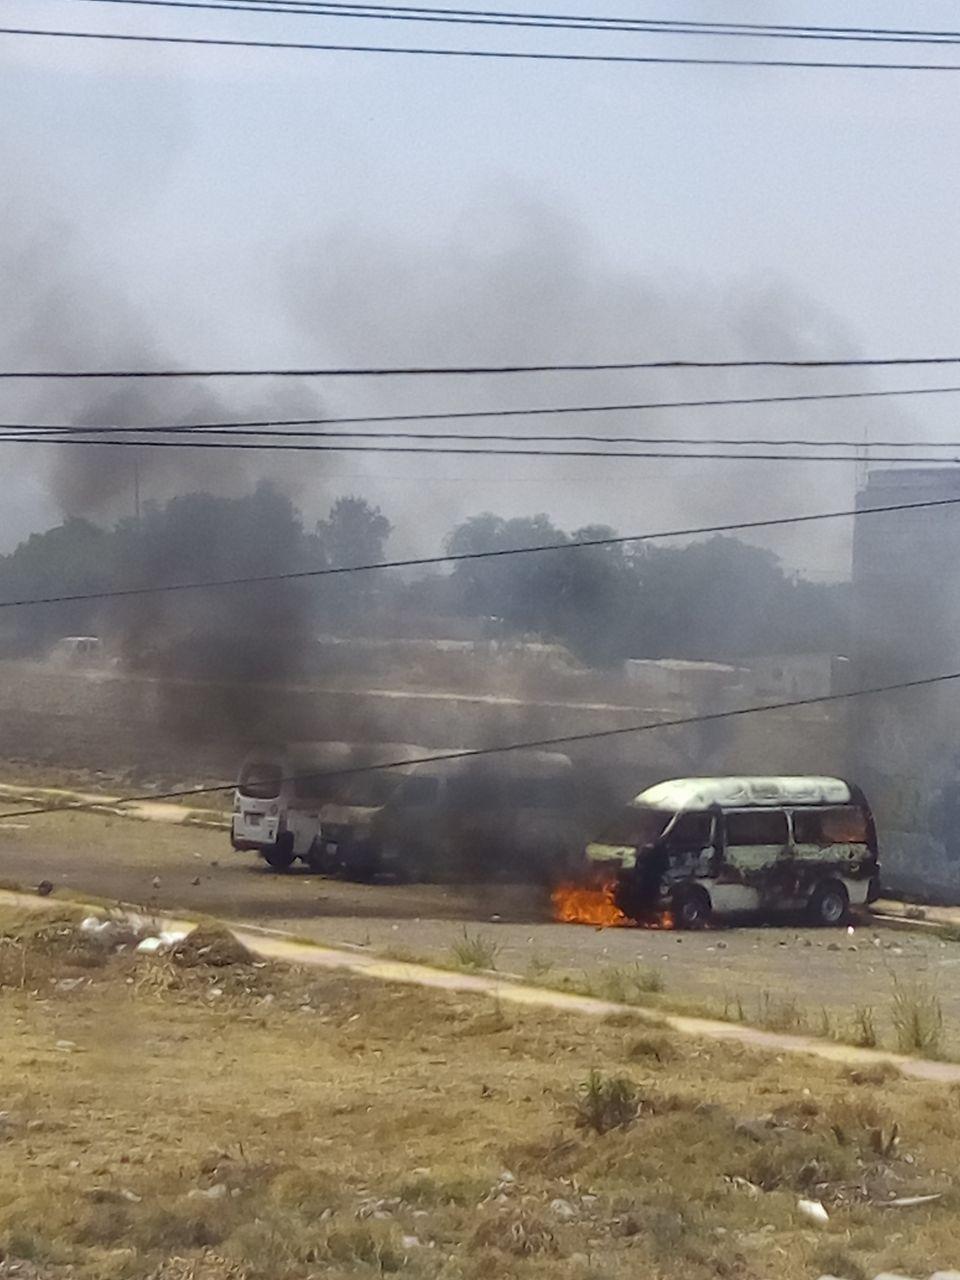 Incumple transportista con indemnización; Semovi retira unidades en Zumpango